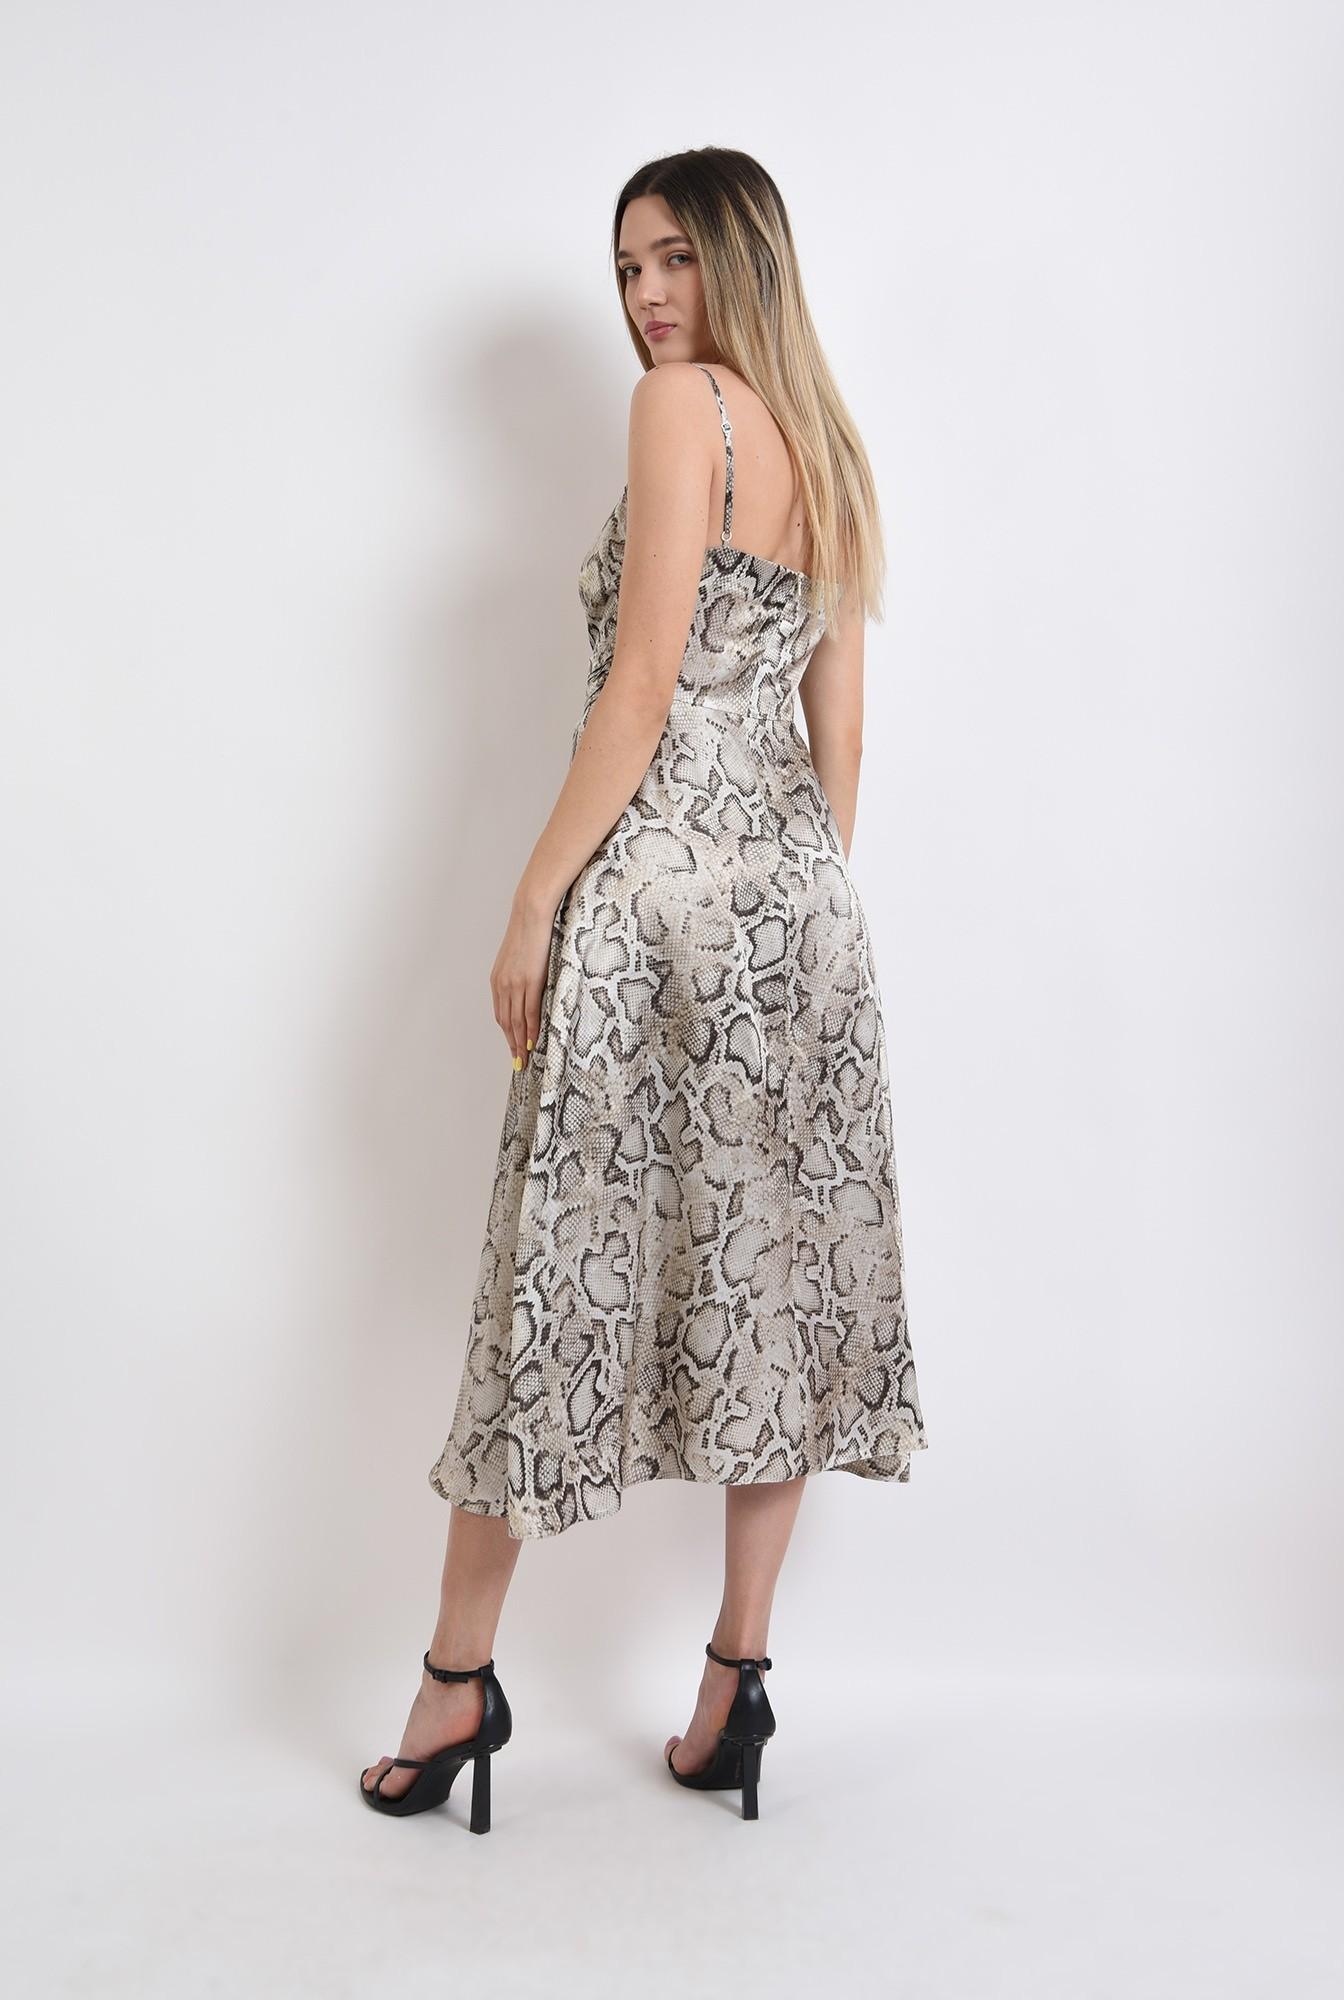 1 - rochie midi, eleganta, animal print, cu decupaj, fronsata pe accesoriu